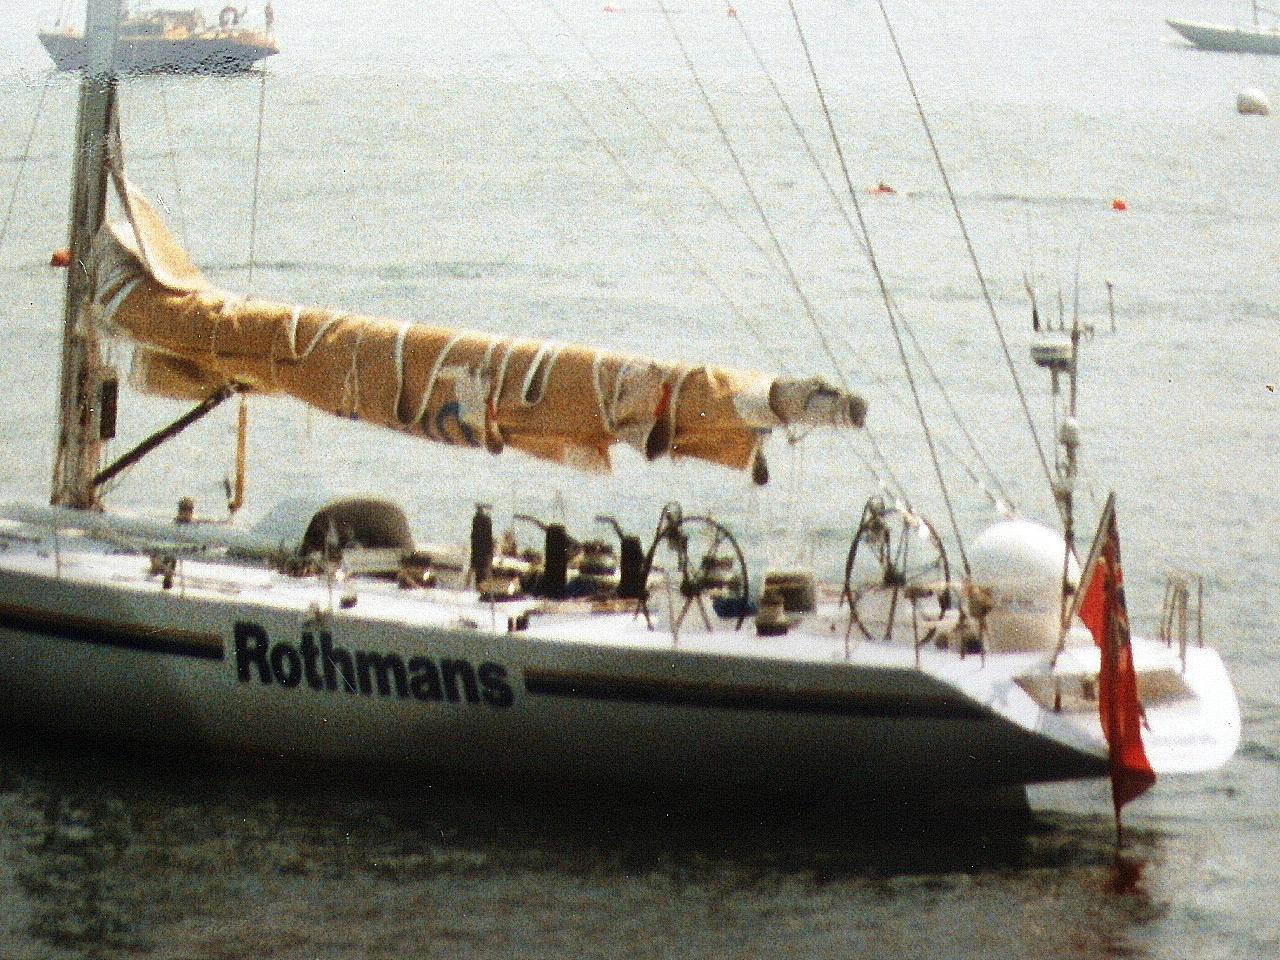 Roscommon, MI - Lake James 4th of July boat parade 2012